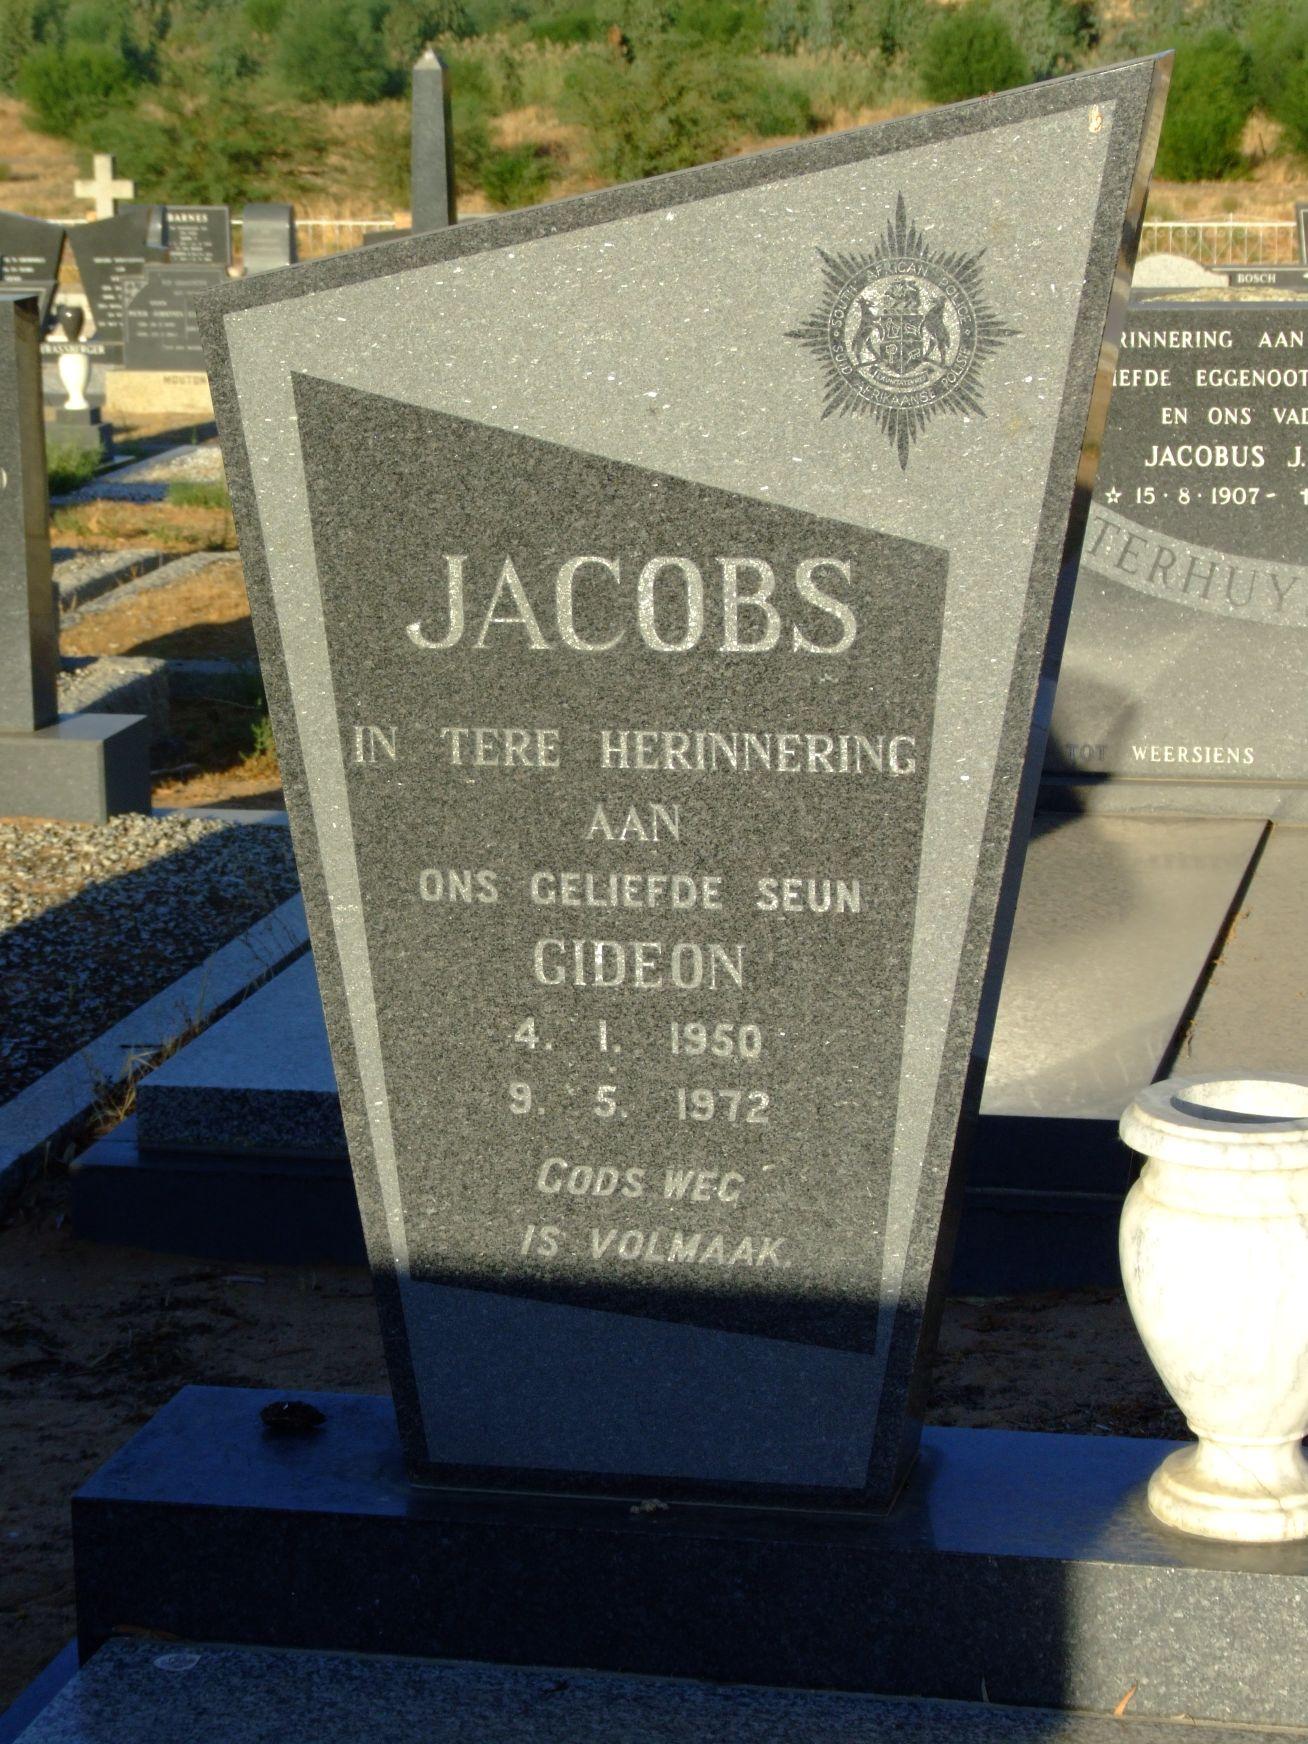 Jacobs, Gideon